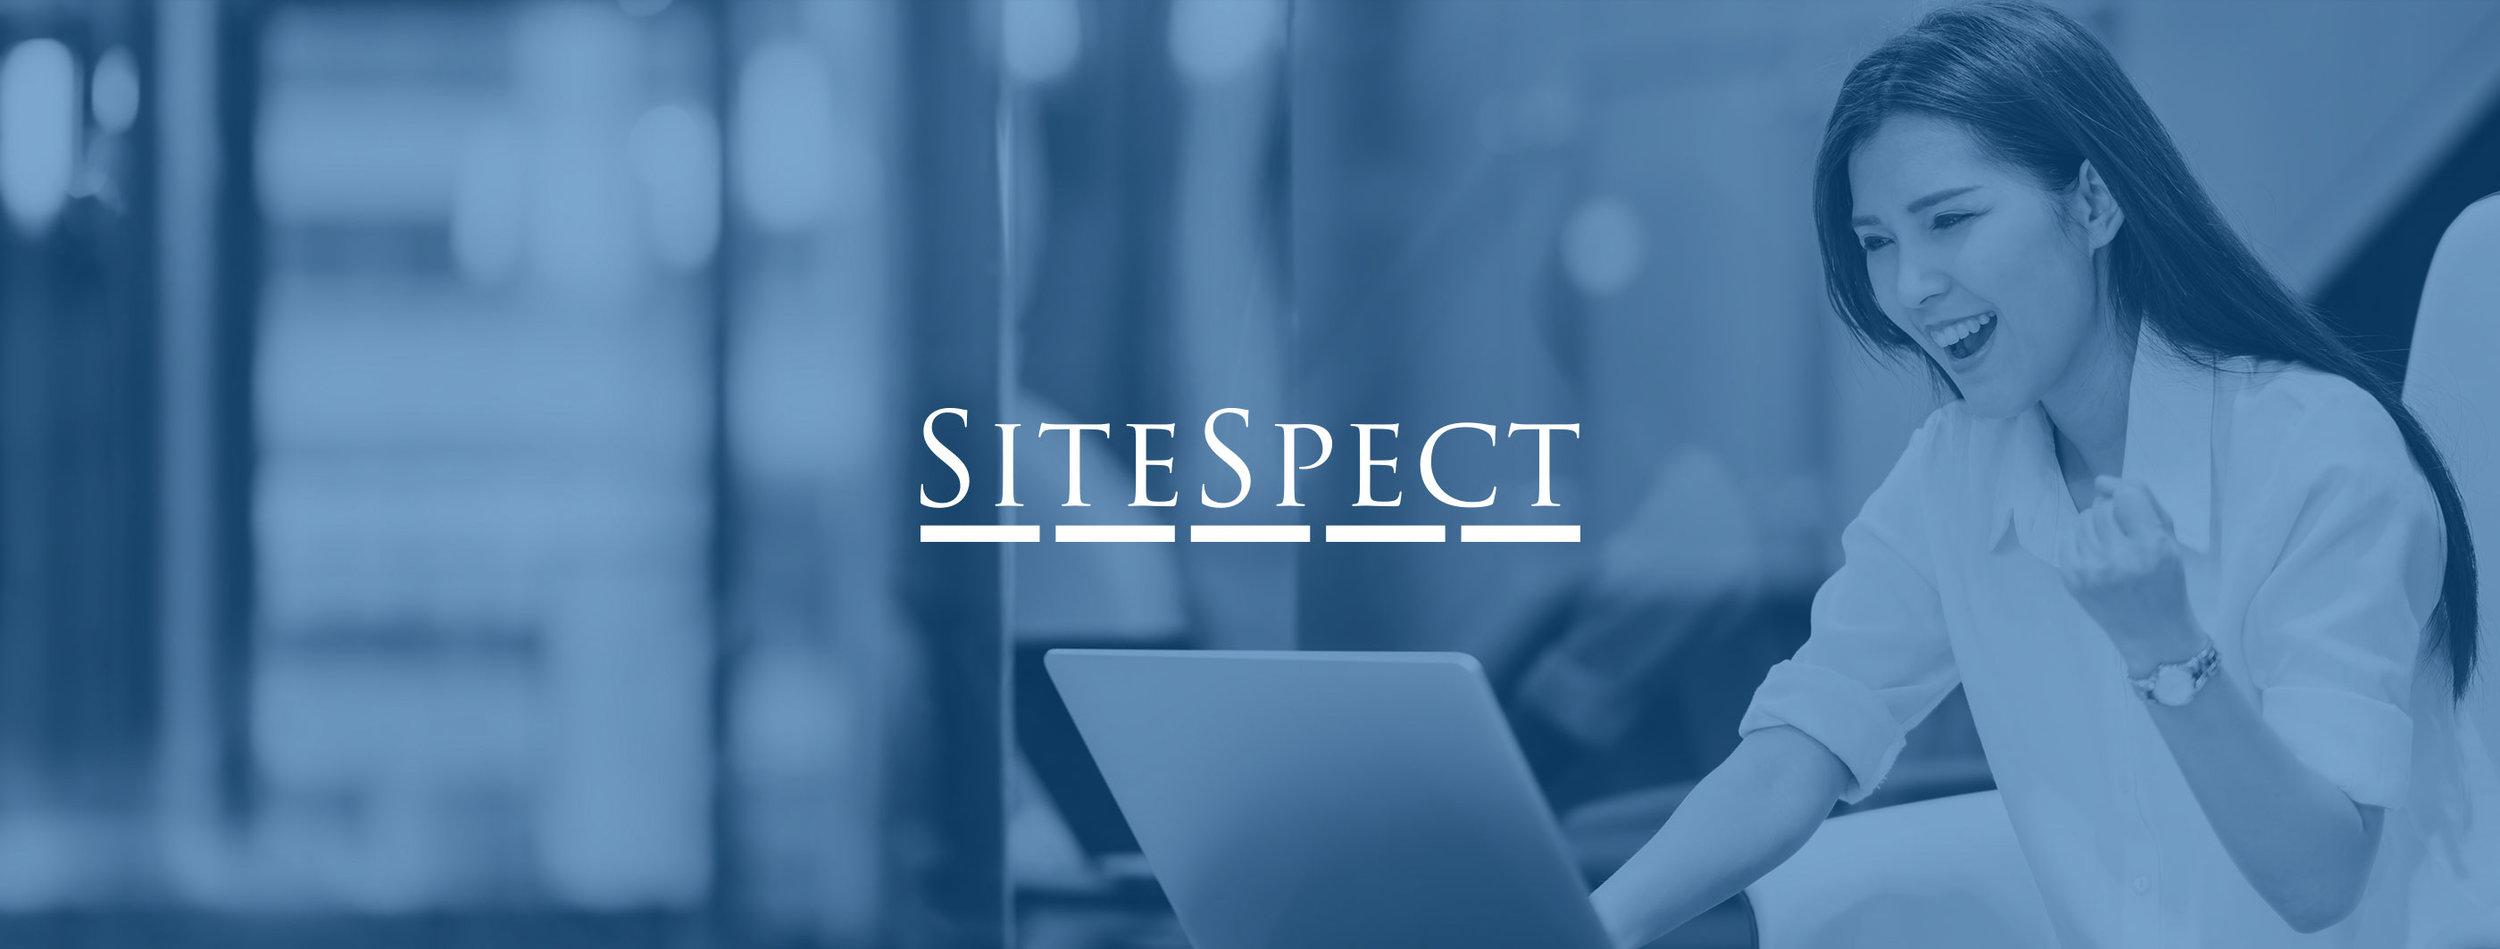 Studio-Eighty-Seven-SiteSpect-Marketing-Support-MainImage.jpg